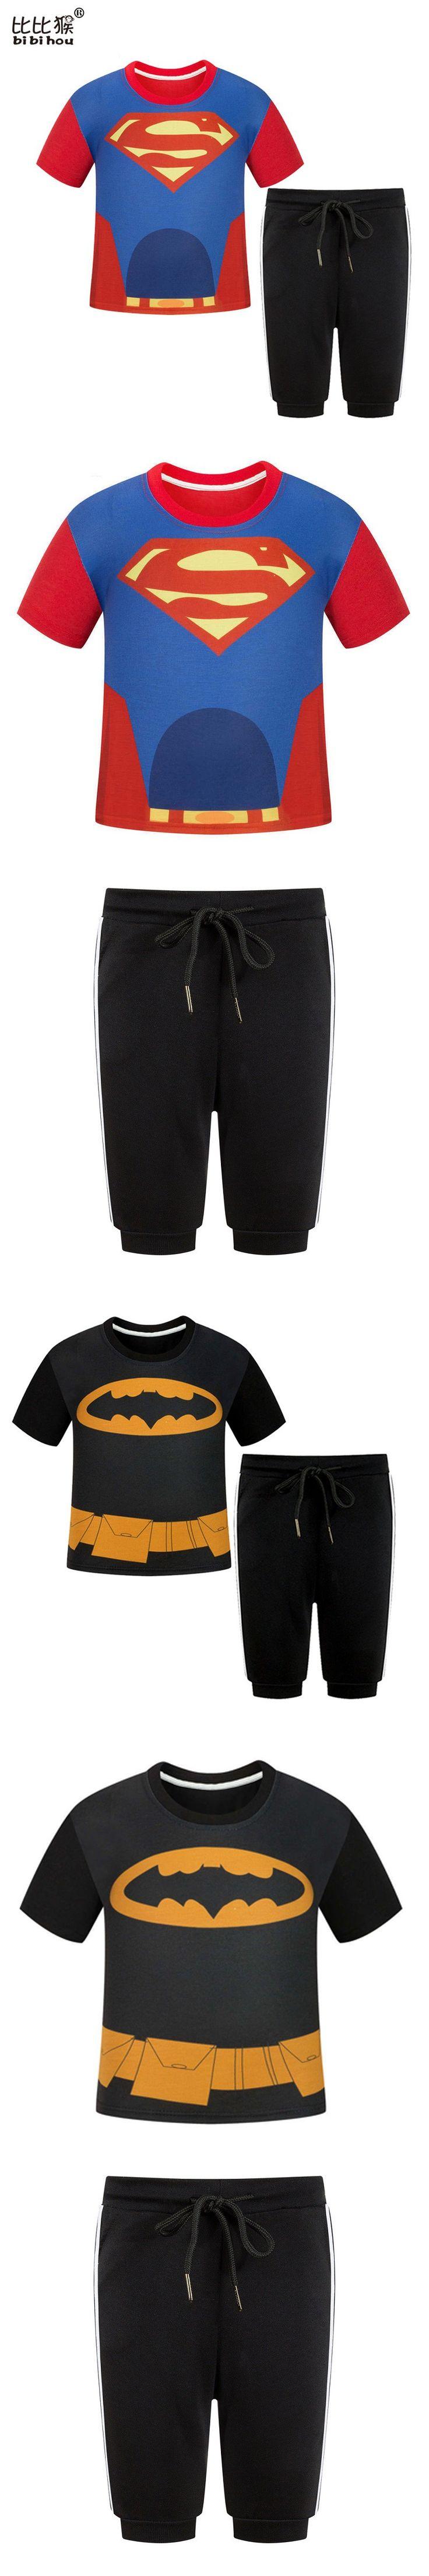 Hot sale Red Boys Clothing Set Summer superman O-Neck infant batman Pants boy sports Suit Children polyester short Clothes Set $20.99